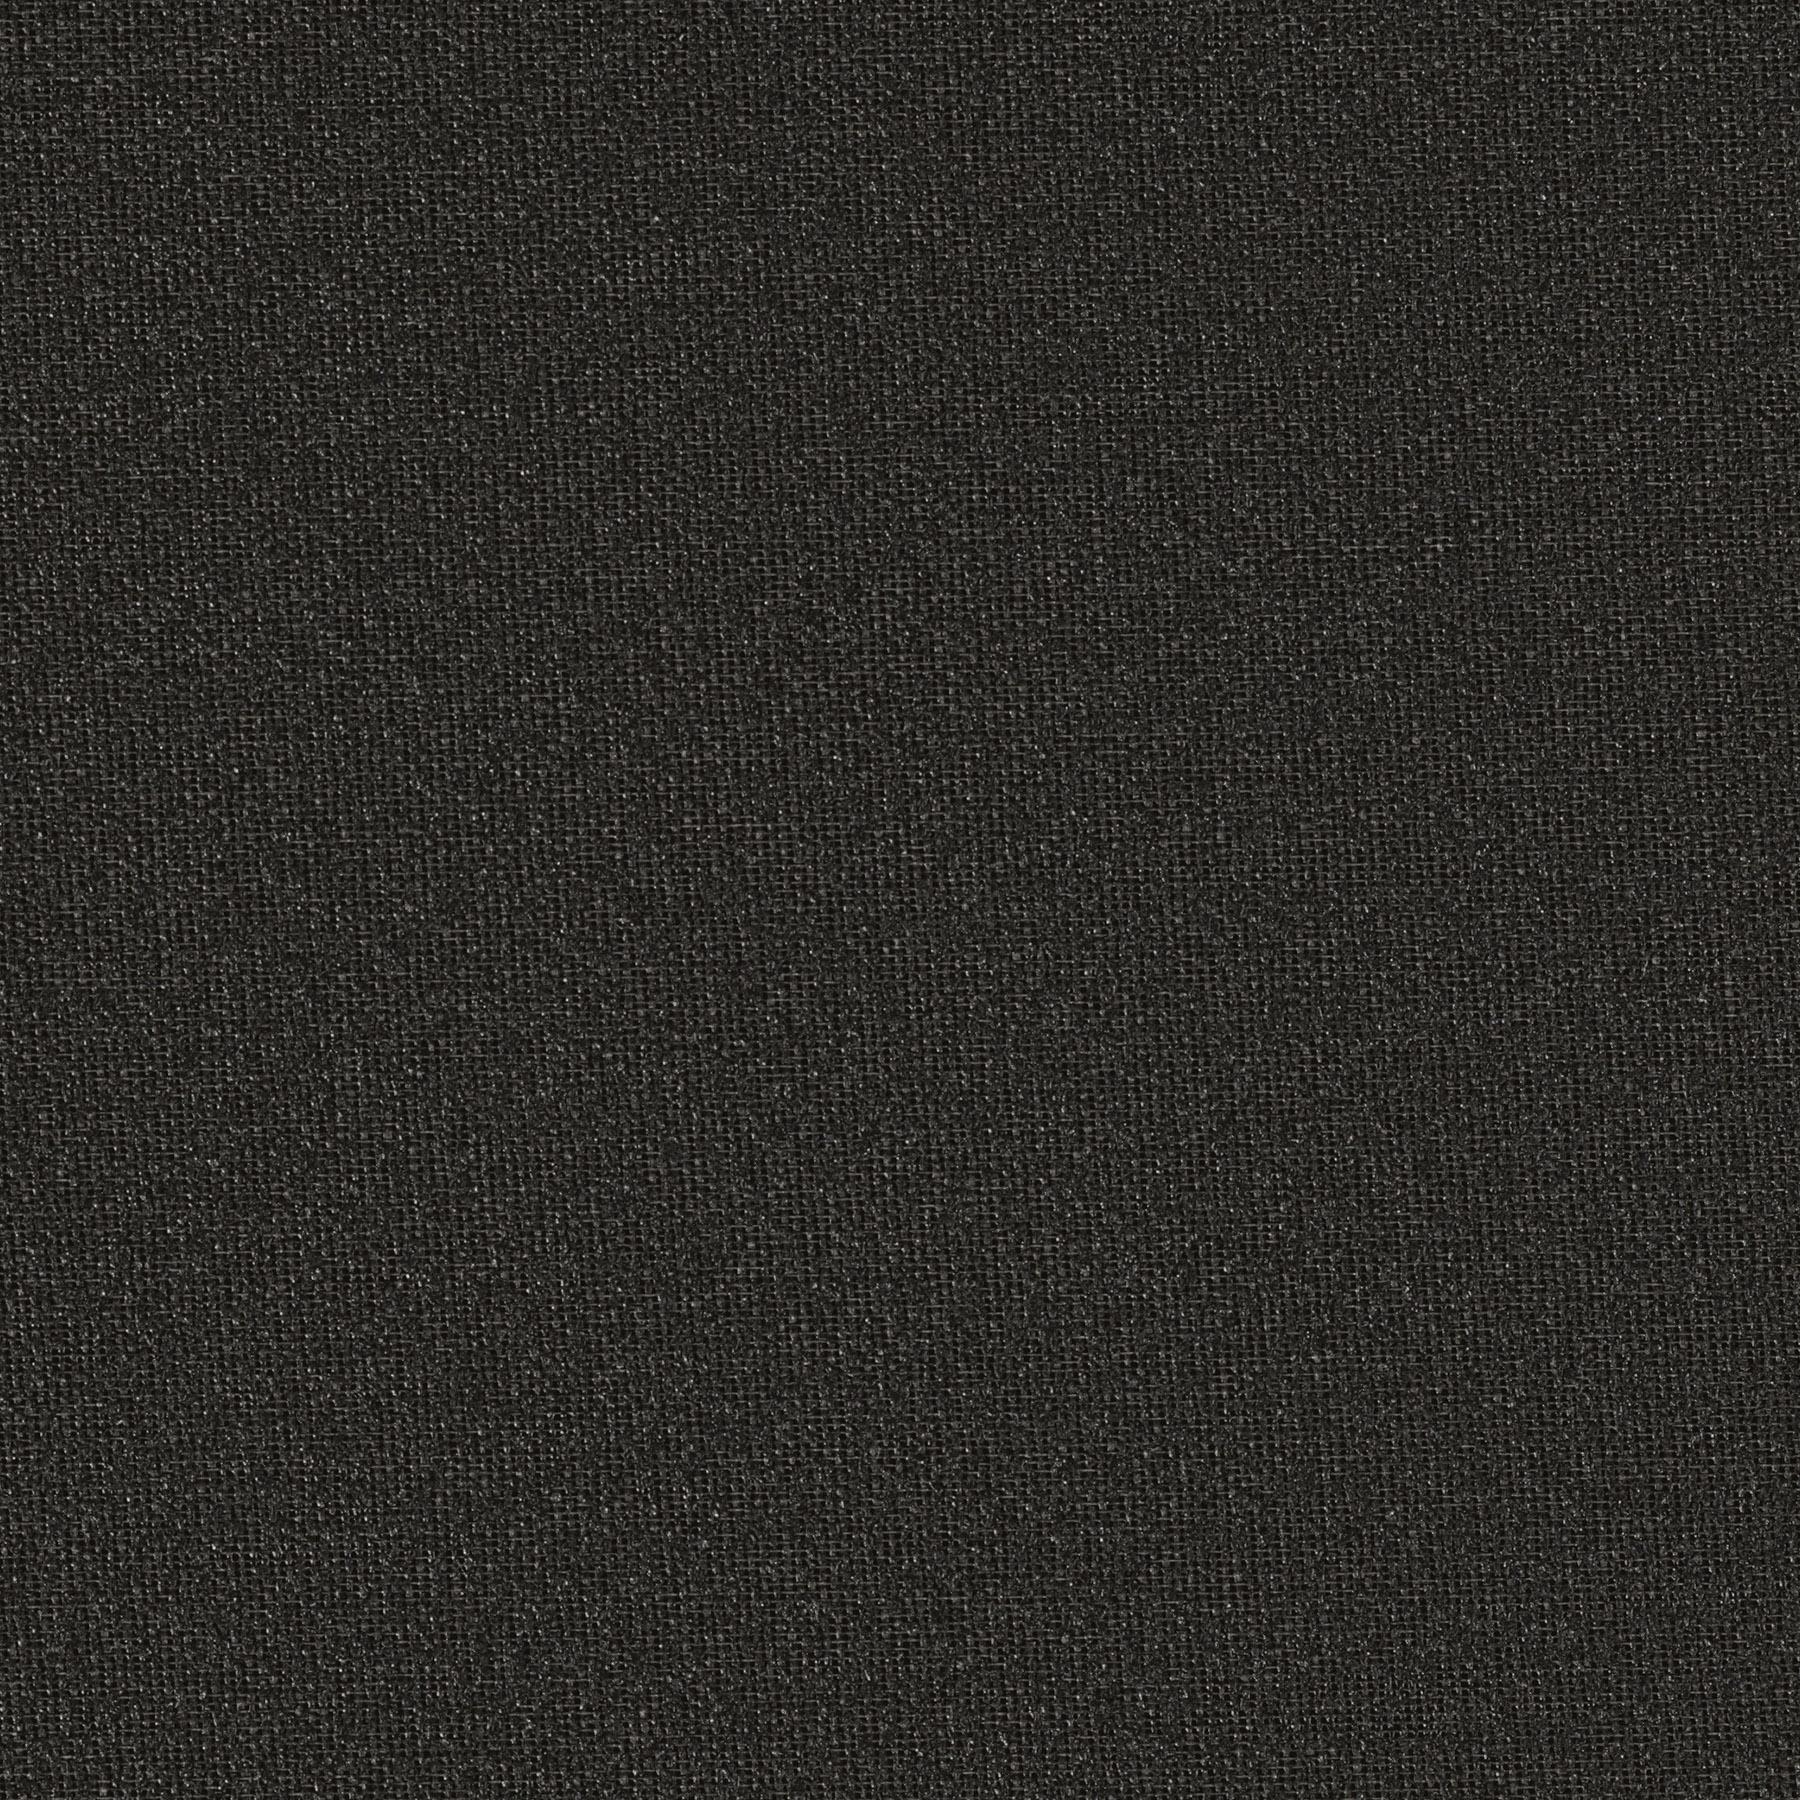 Black Marine Underliner Fabric Jt S Outdoor Fabrics In